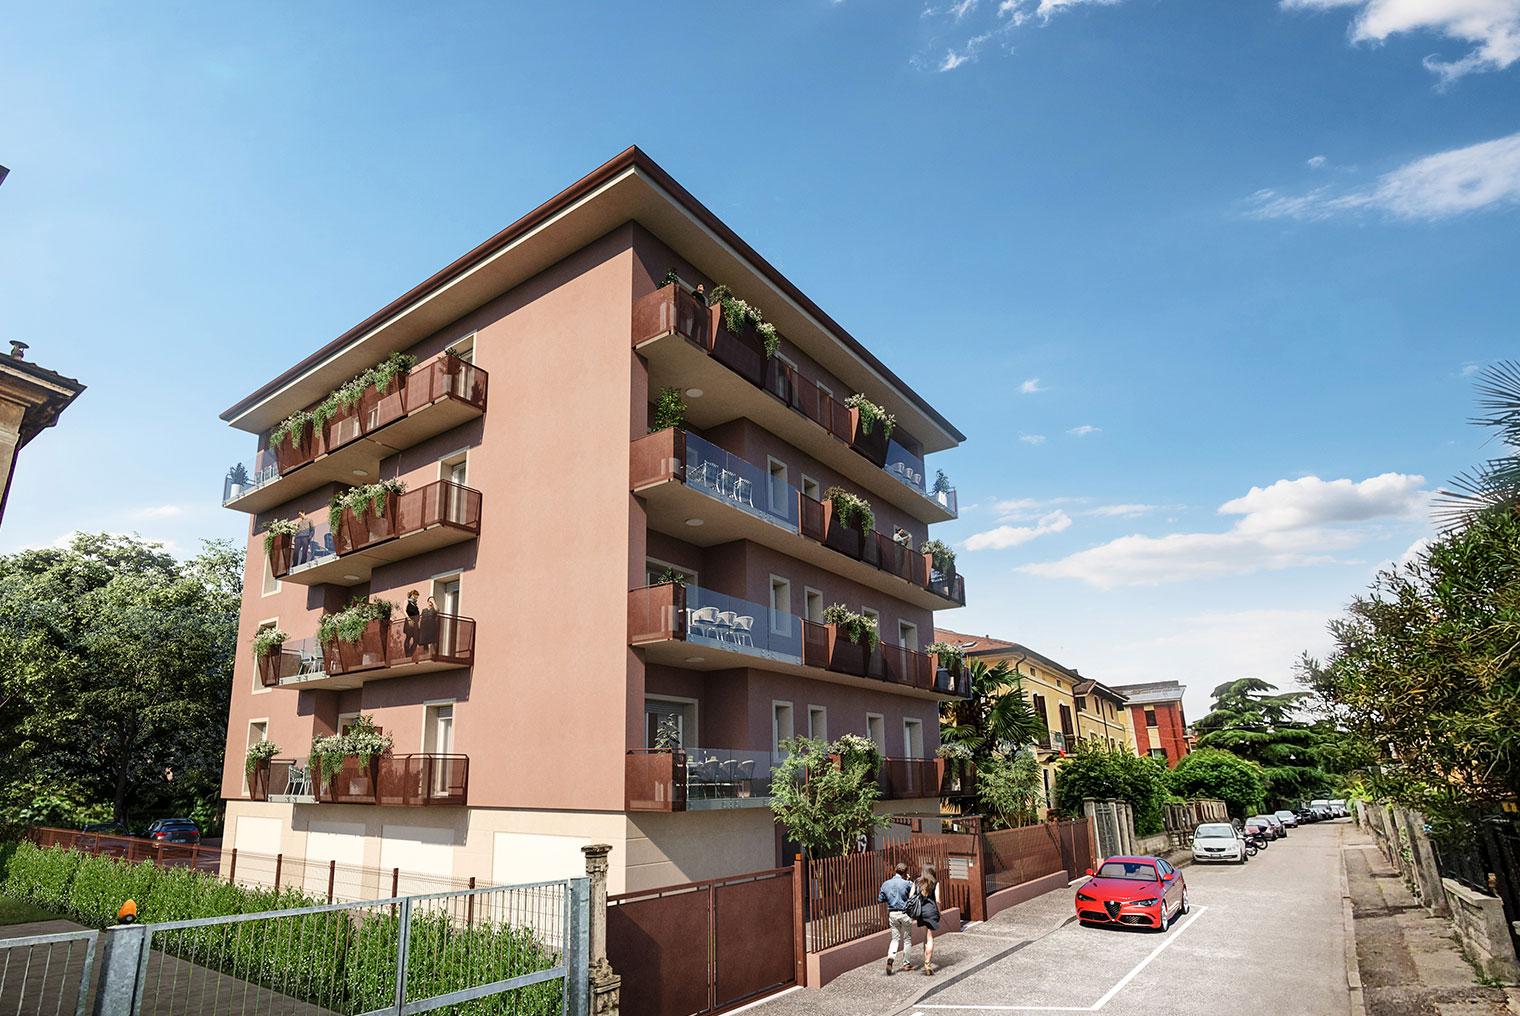 Foroni19 - Verona